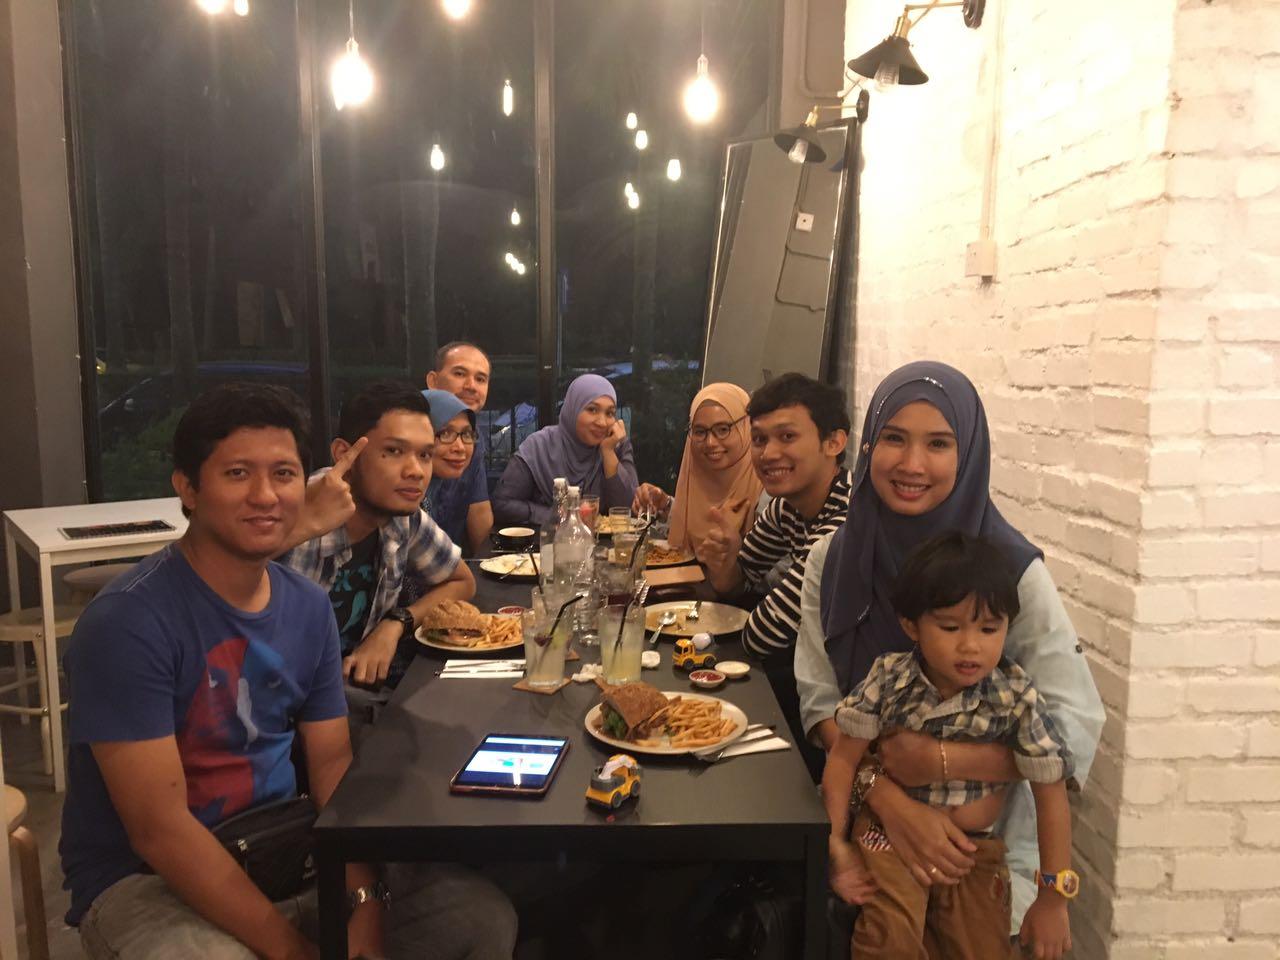 Anechoic Cafe - Damansara Perdana, Selangor